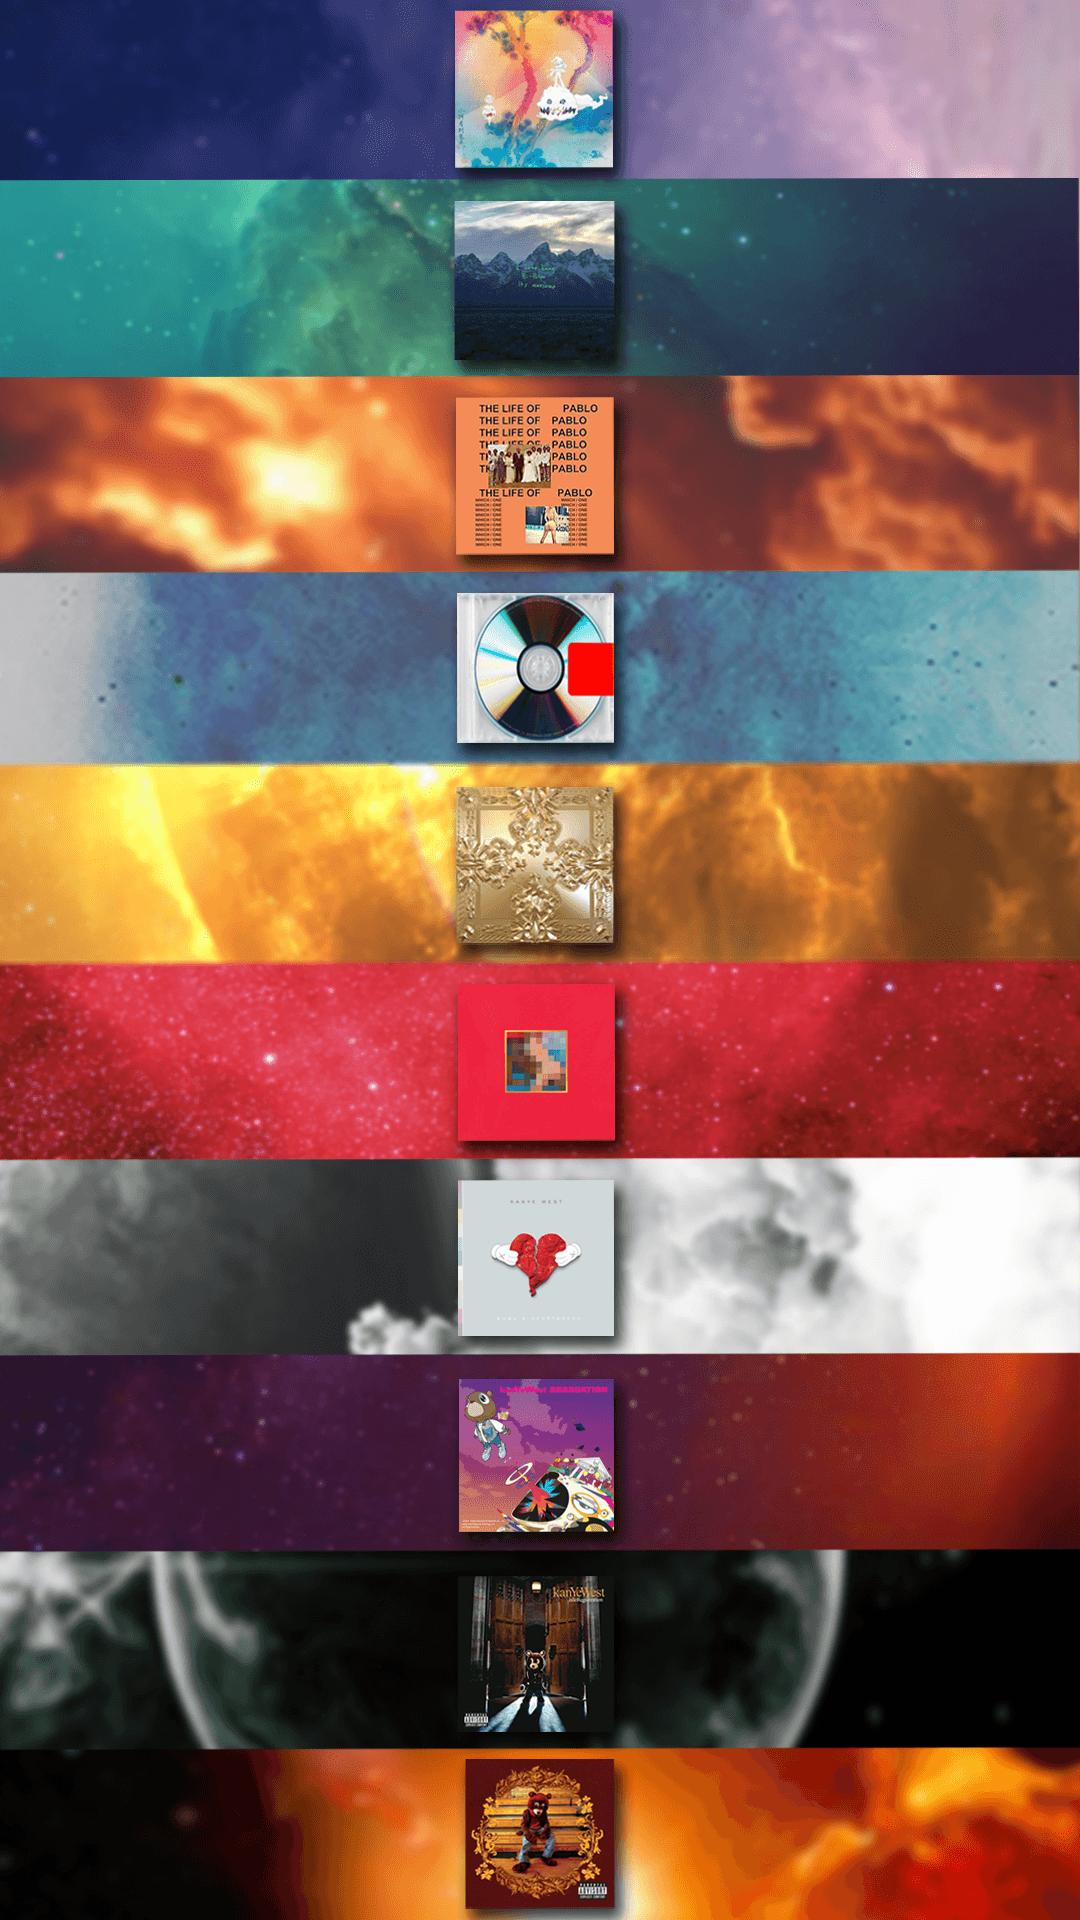 Kanye Albums Wallpapers On Wallpaperdog